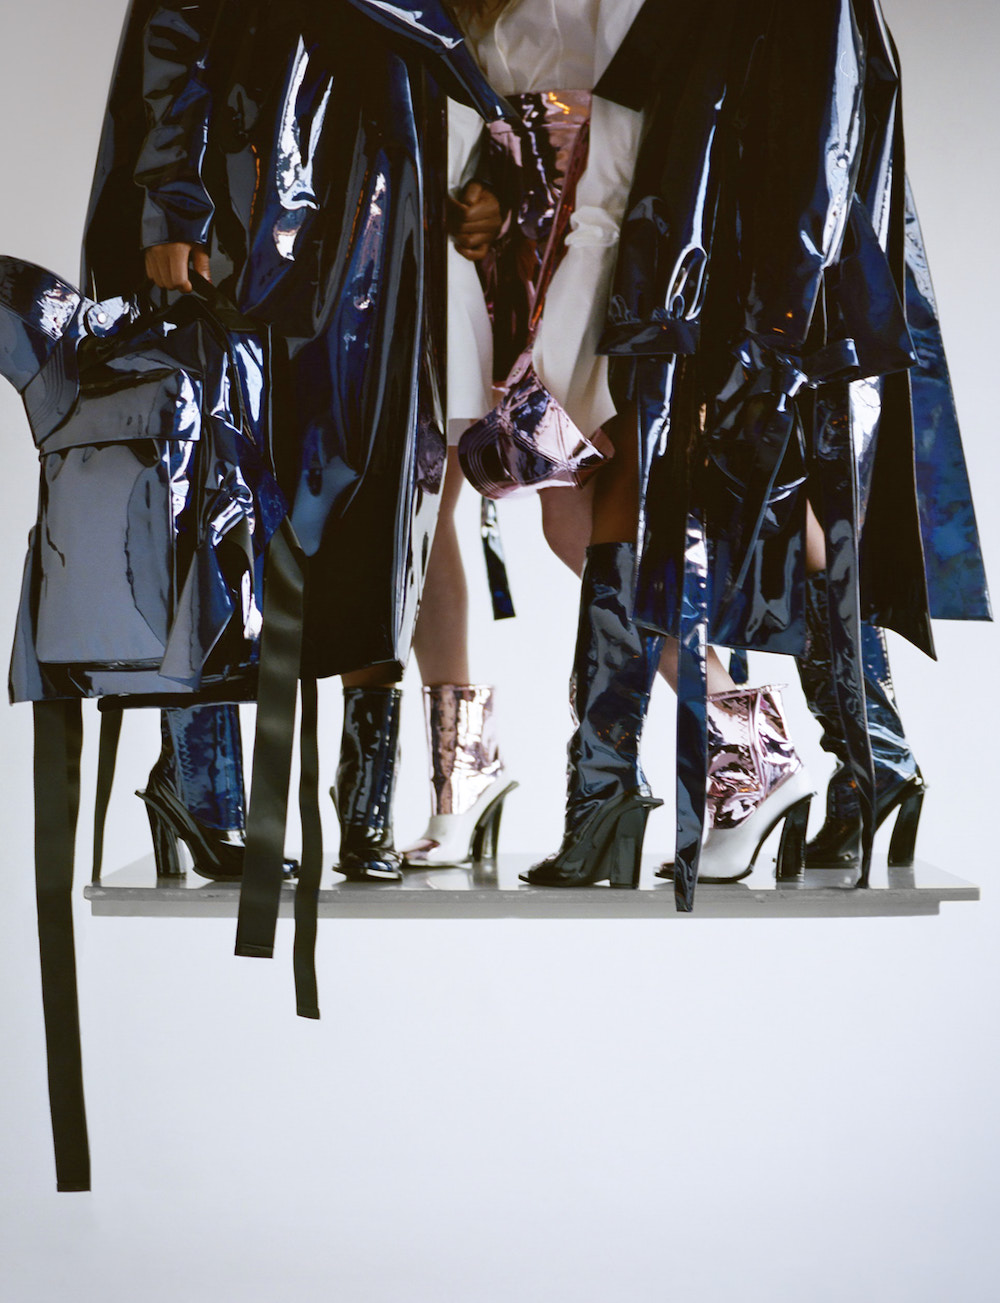 Hew Wang - MA Fashion Design Technology womenswear, 2017; Photography by Felix Cooper, styling by Anders Sølvsten Thomsen, hair Roxy Attard, make-up artist Celia Burton; models Yasmina Atta, Tschan Andrews, Anna Pye.